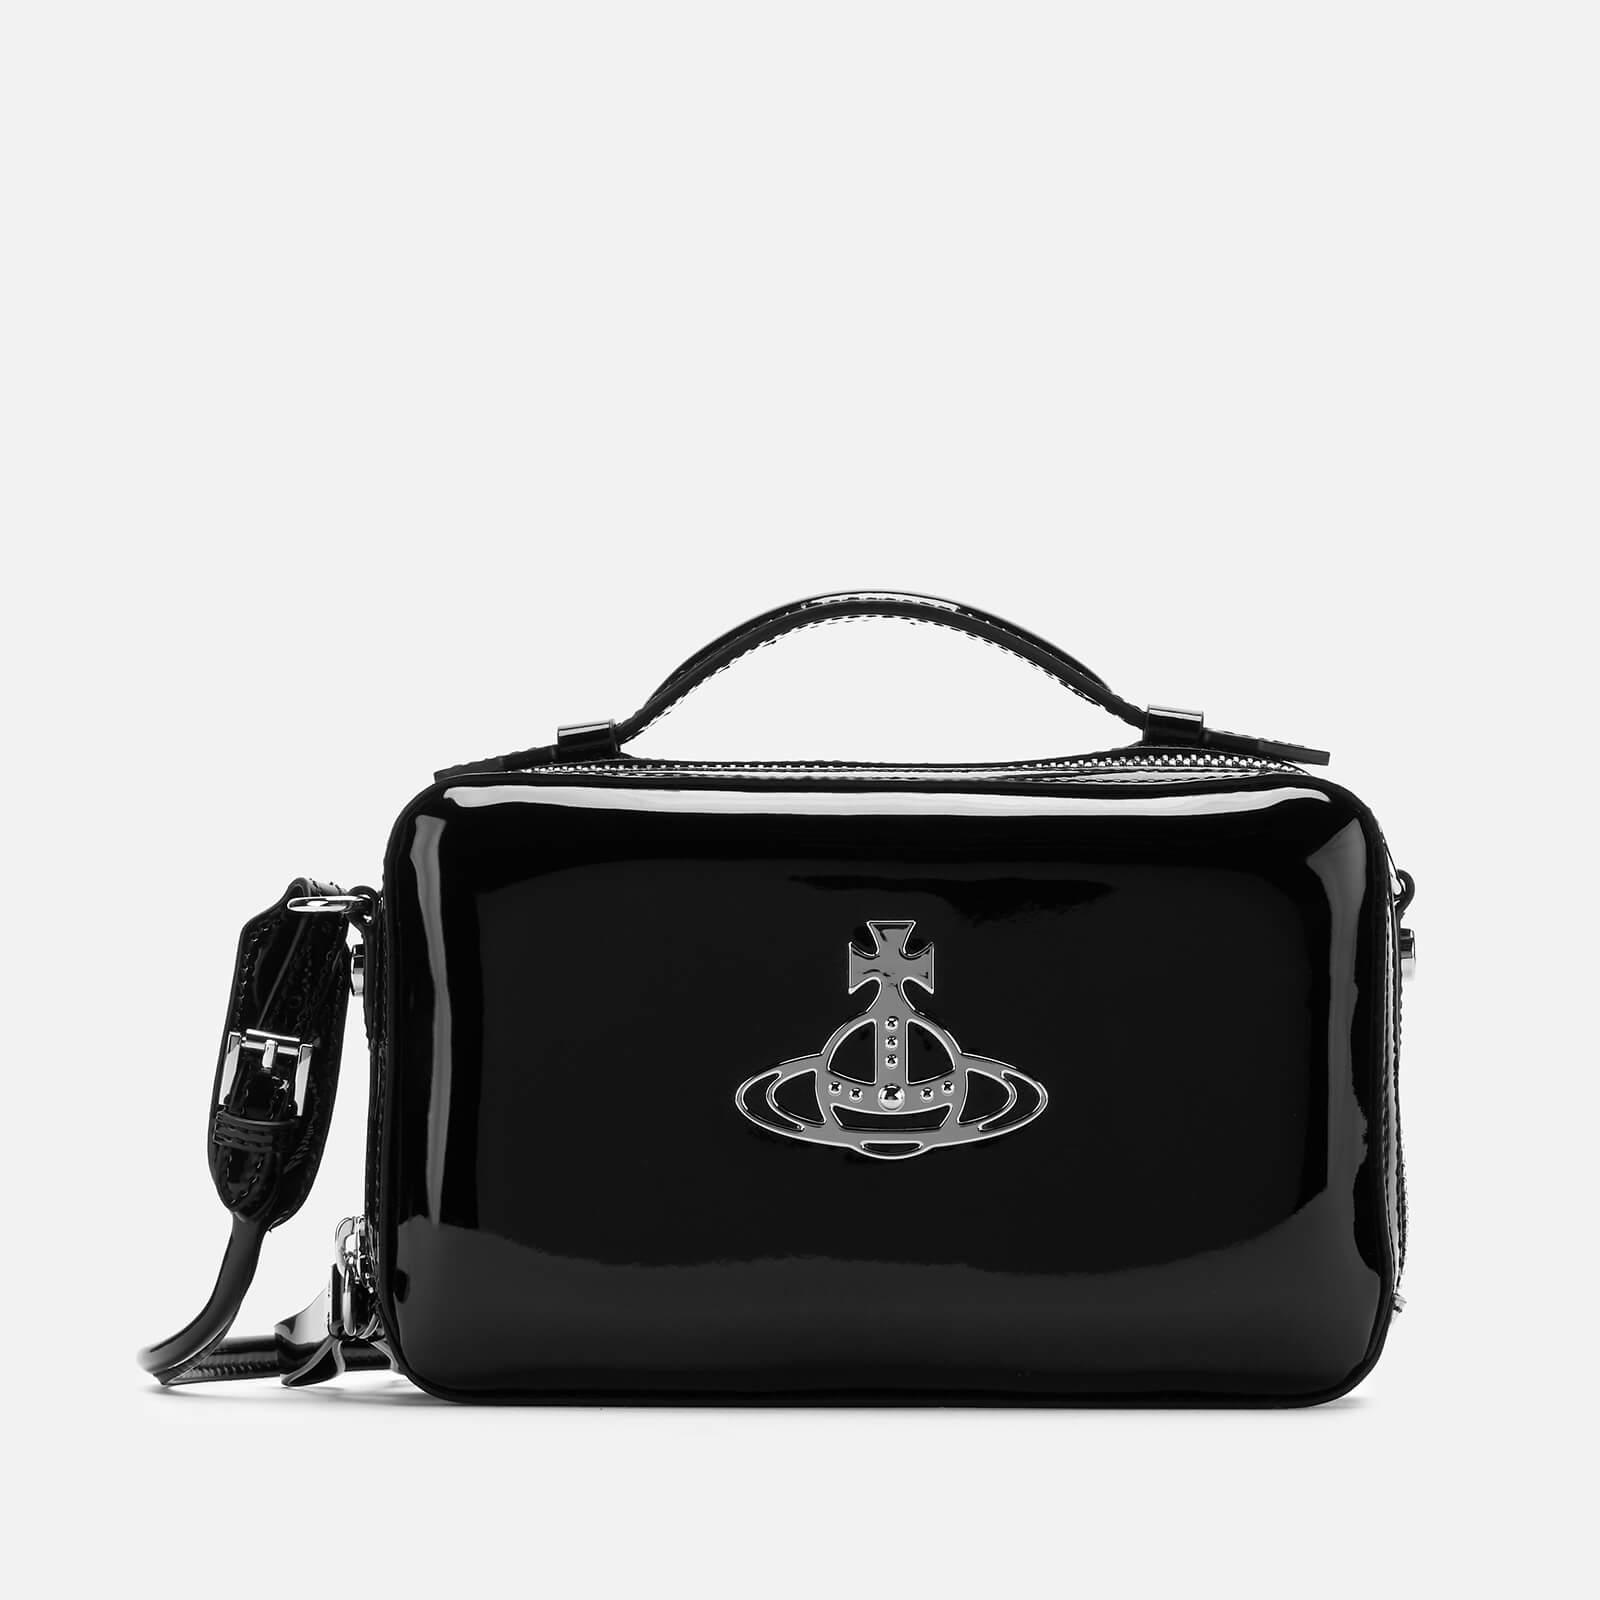 Vivienne Westwood Women S Johanna Camera Bag Black